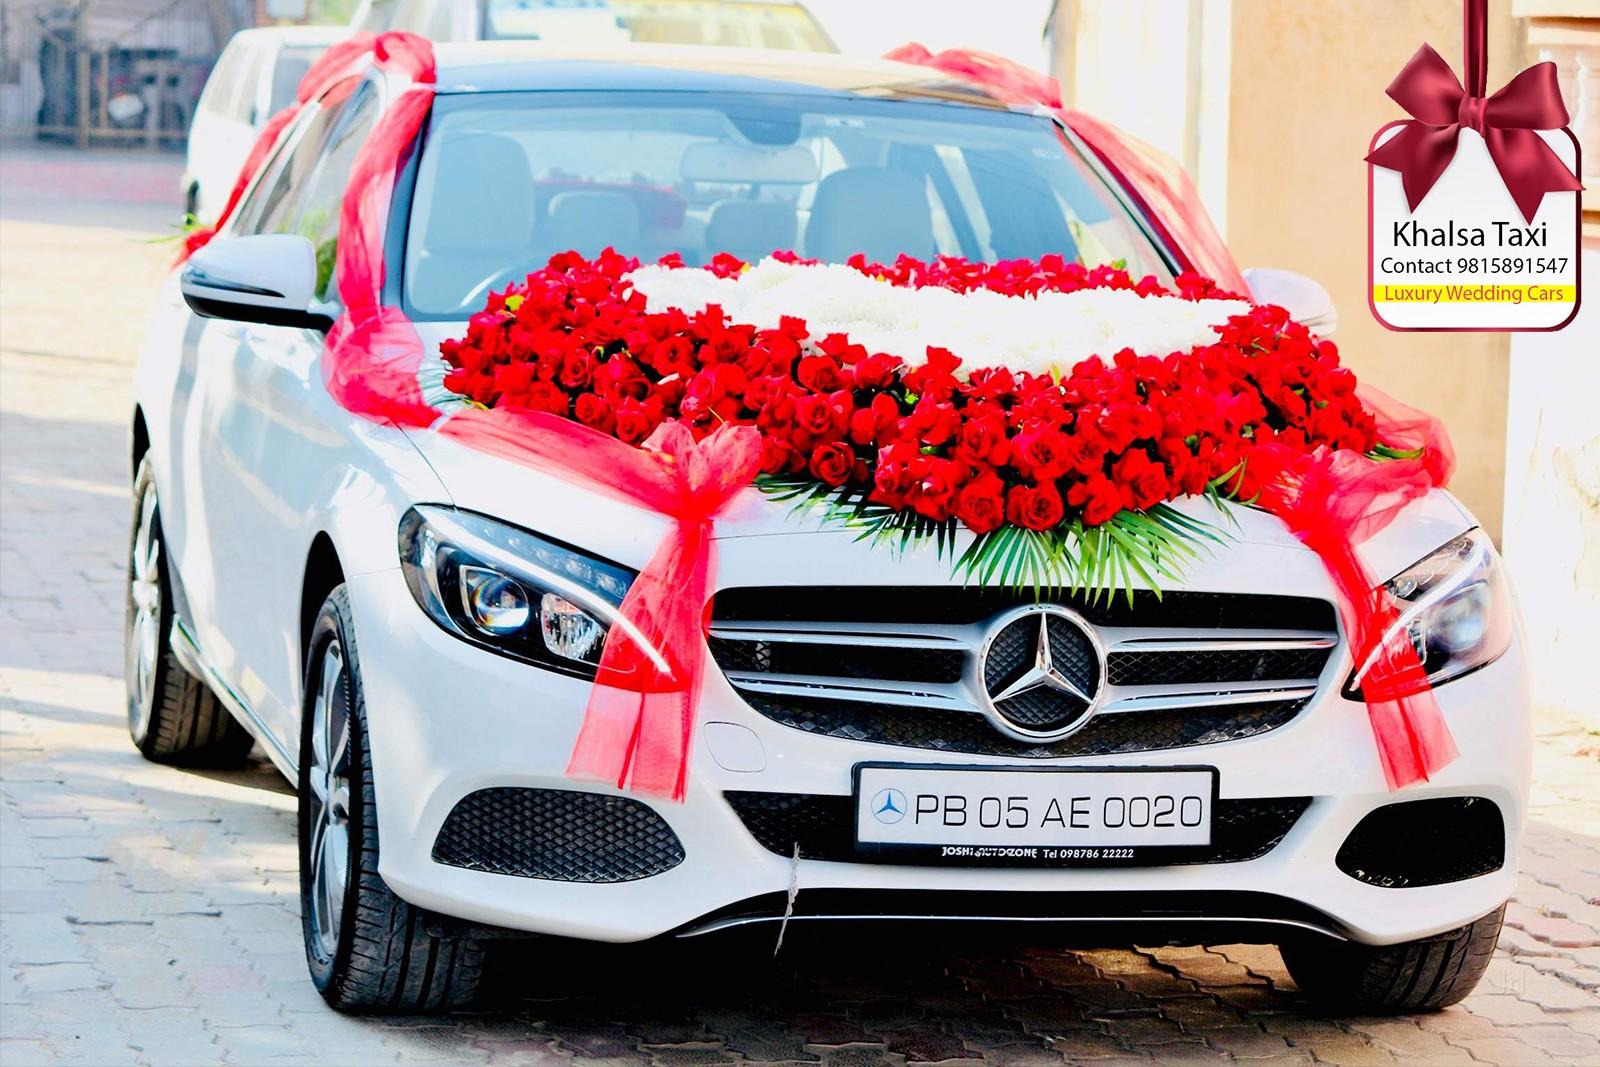 Mohali wedding cars, Mohali luxury wedding Car, Luxury wedding car hire in Mohali